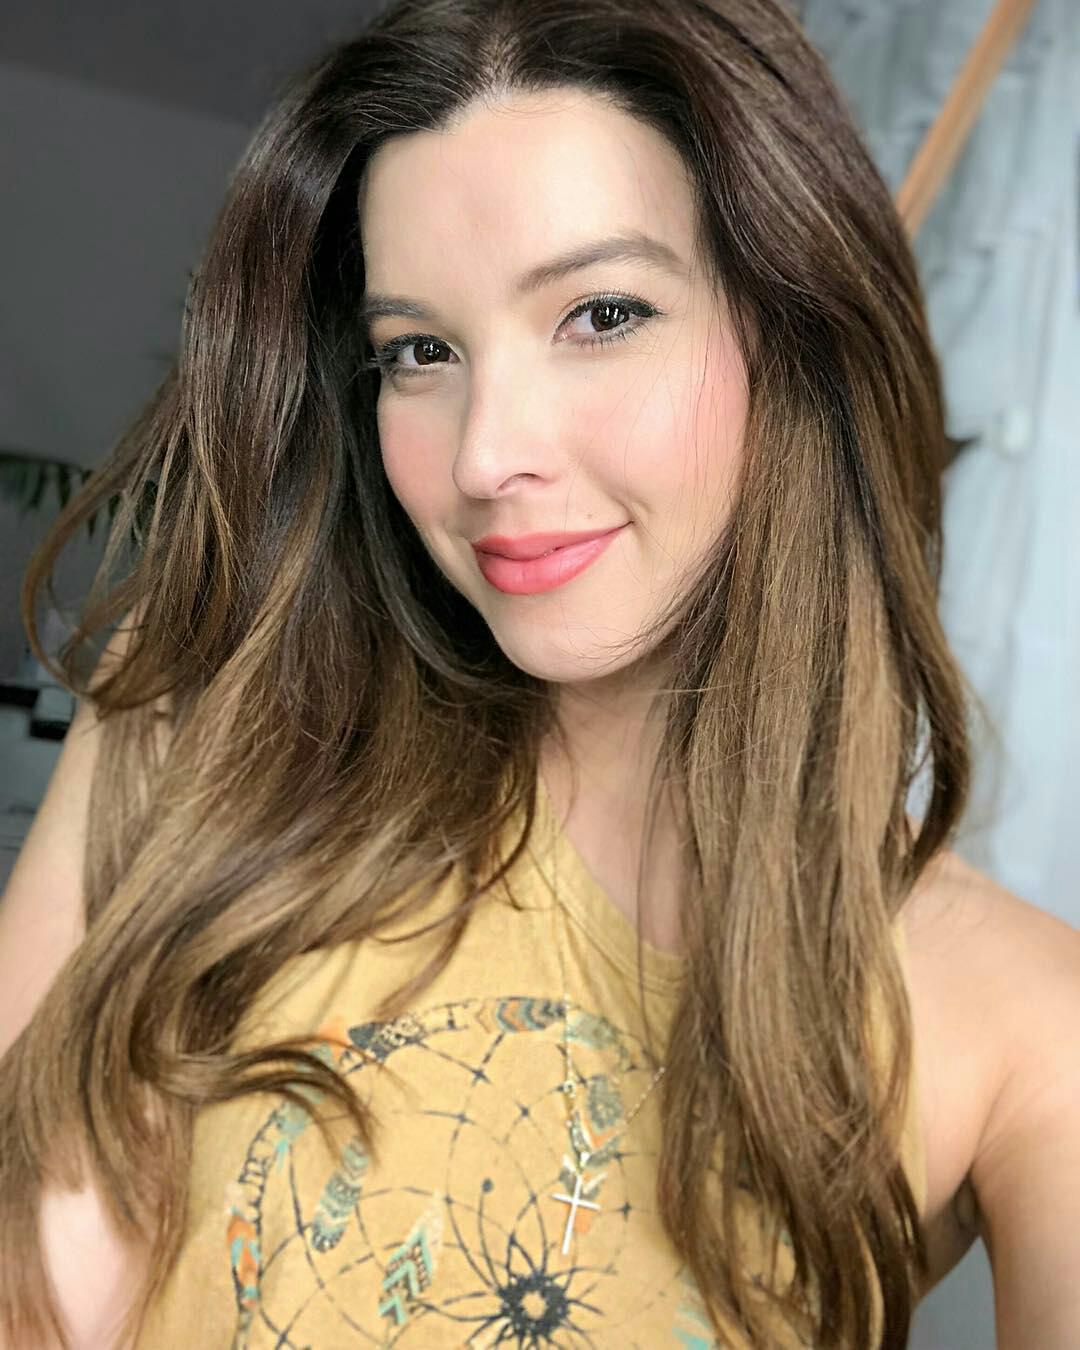 Carolina Gutierrez - Most Beautiful Transgender Woman - TG